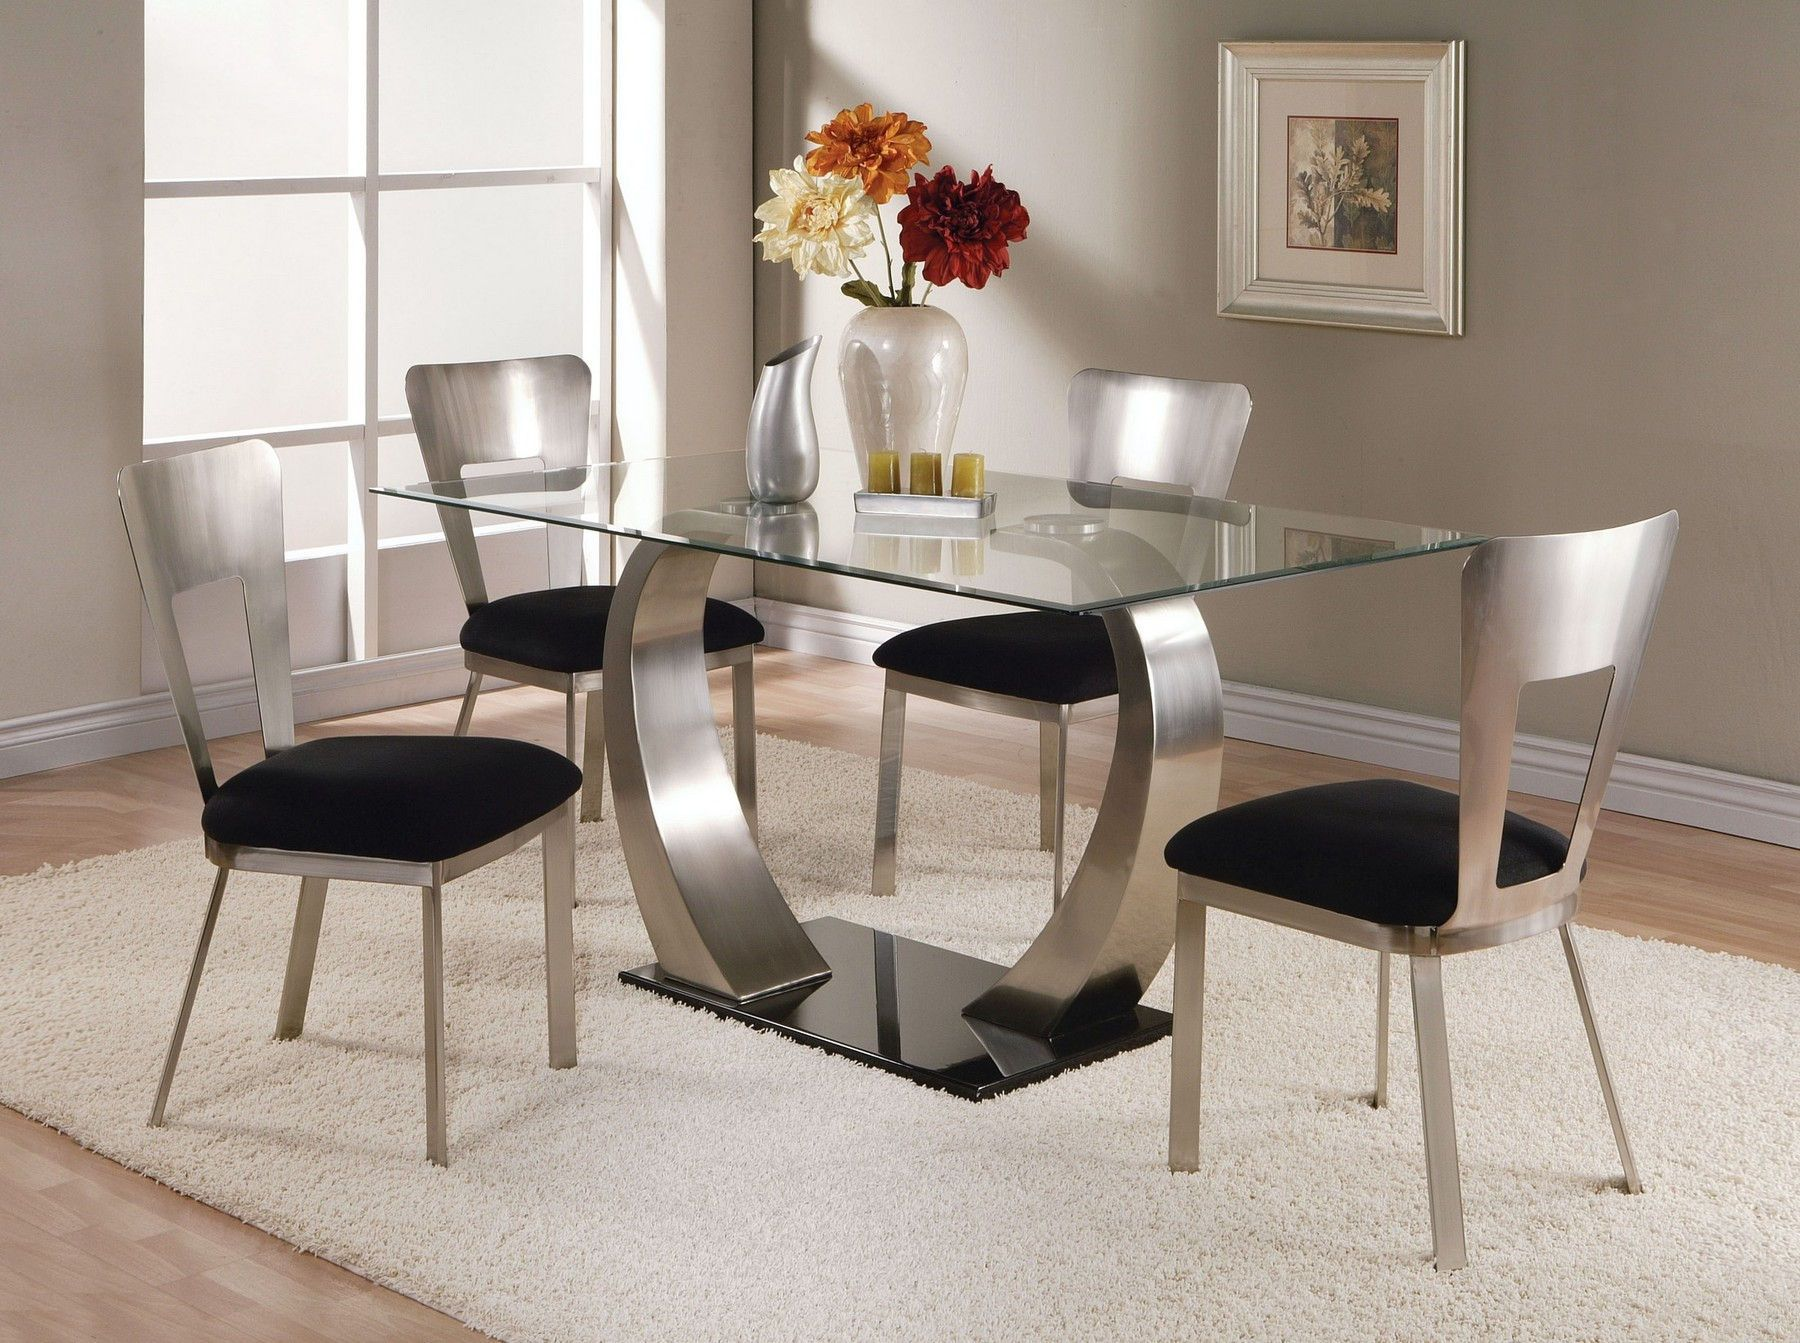 Design Ideas Rectangular Brown Glass Tables Glass Dining Table Glass Dining Table Set Glass Dining Room Table